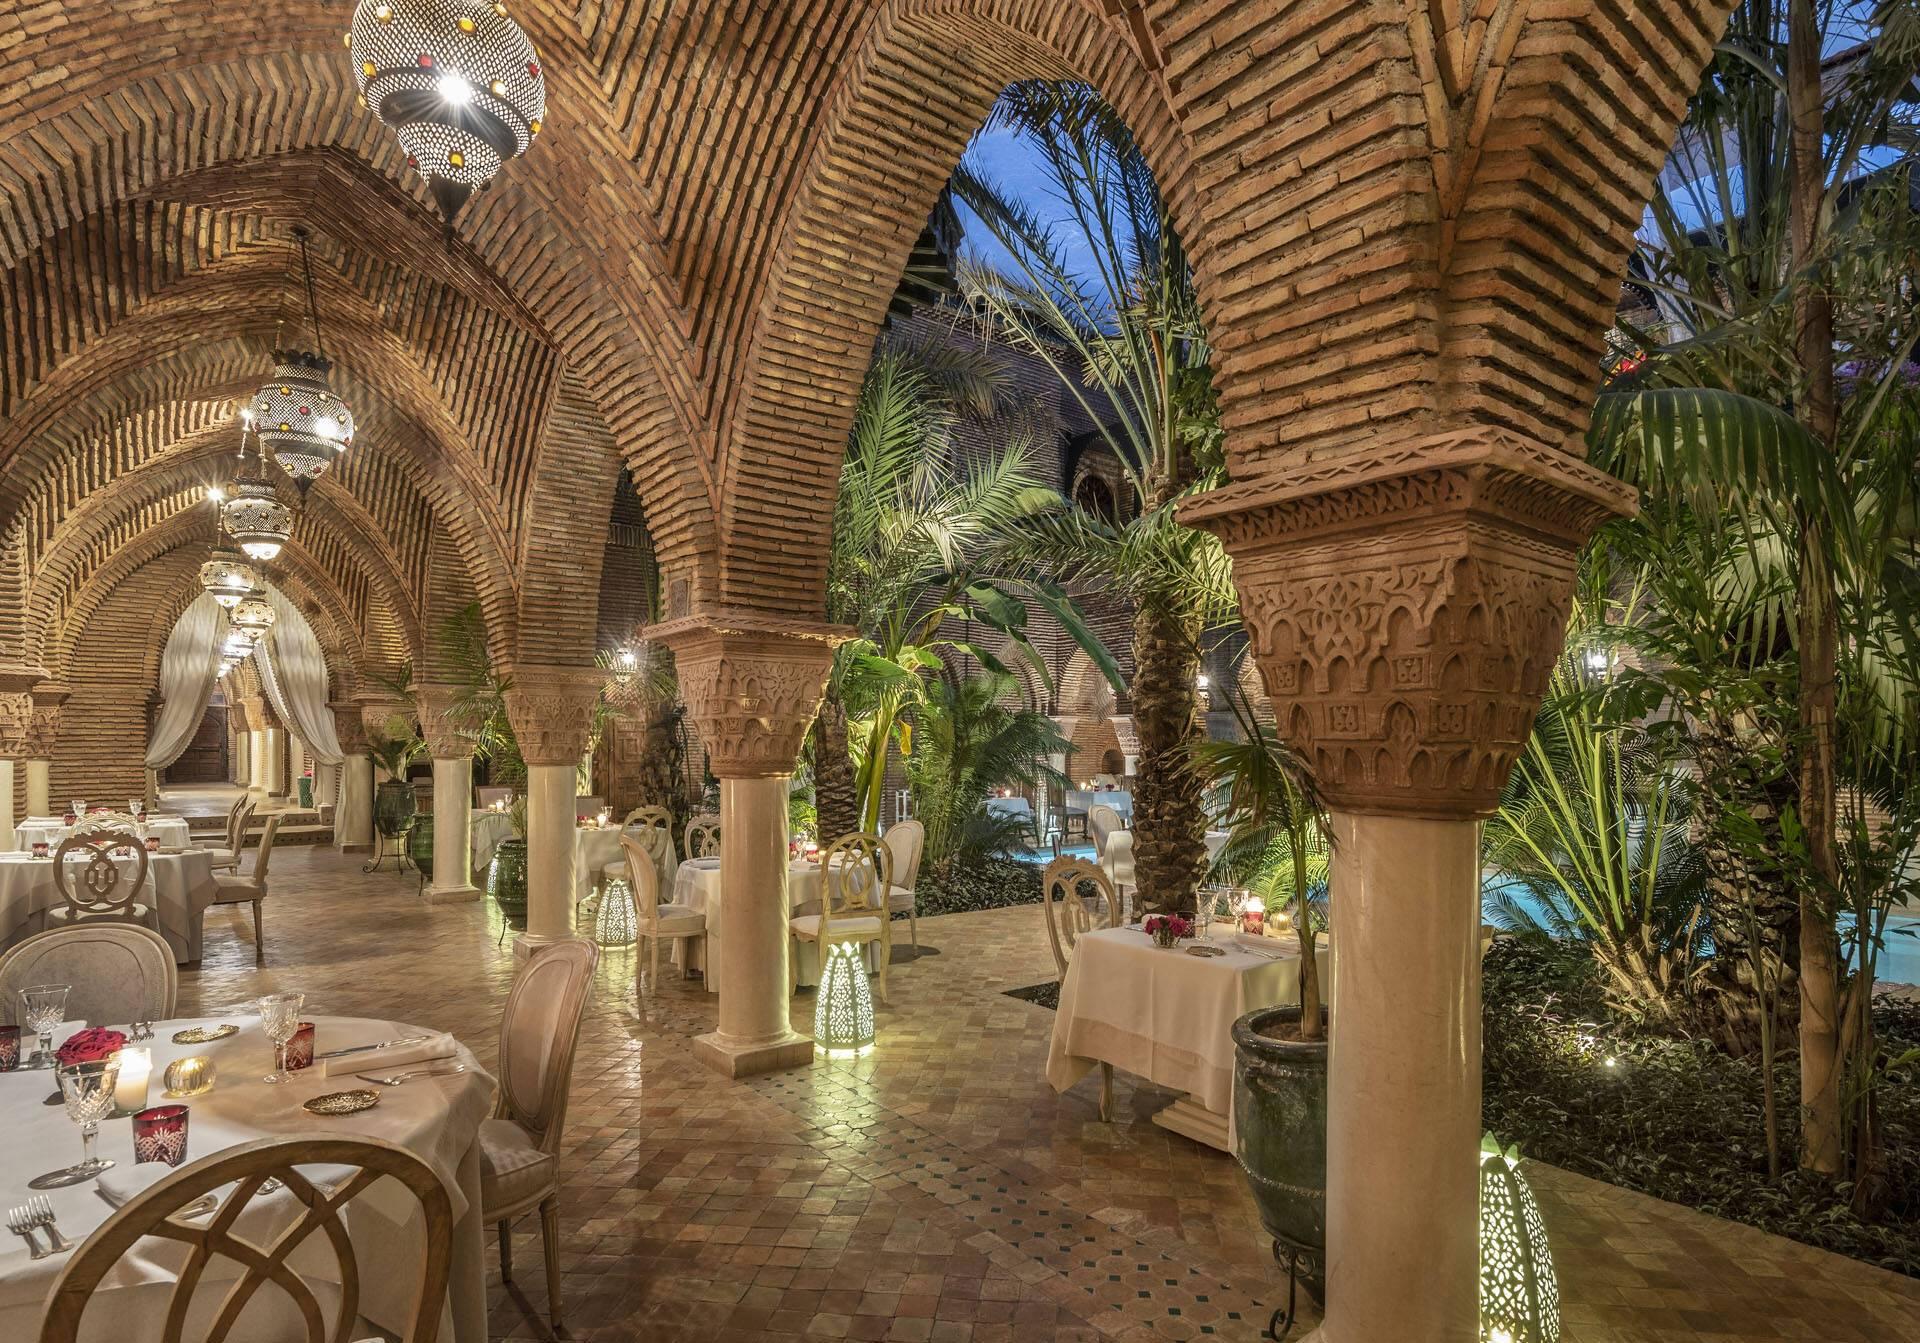 Sultana Marrakech Table La Sultana